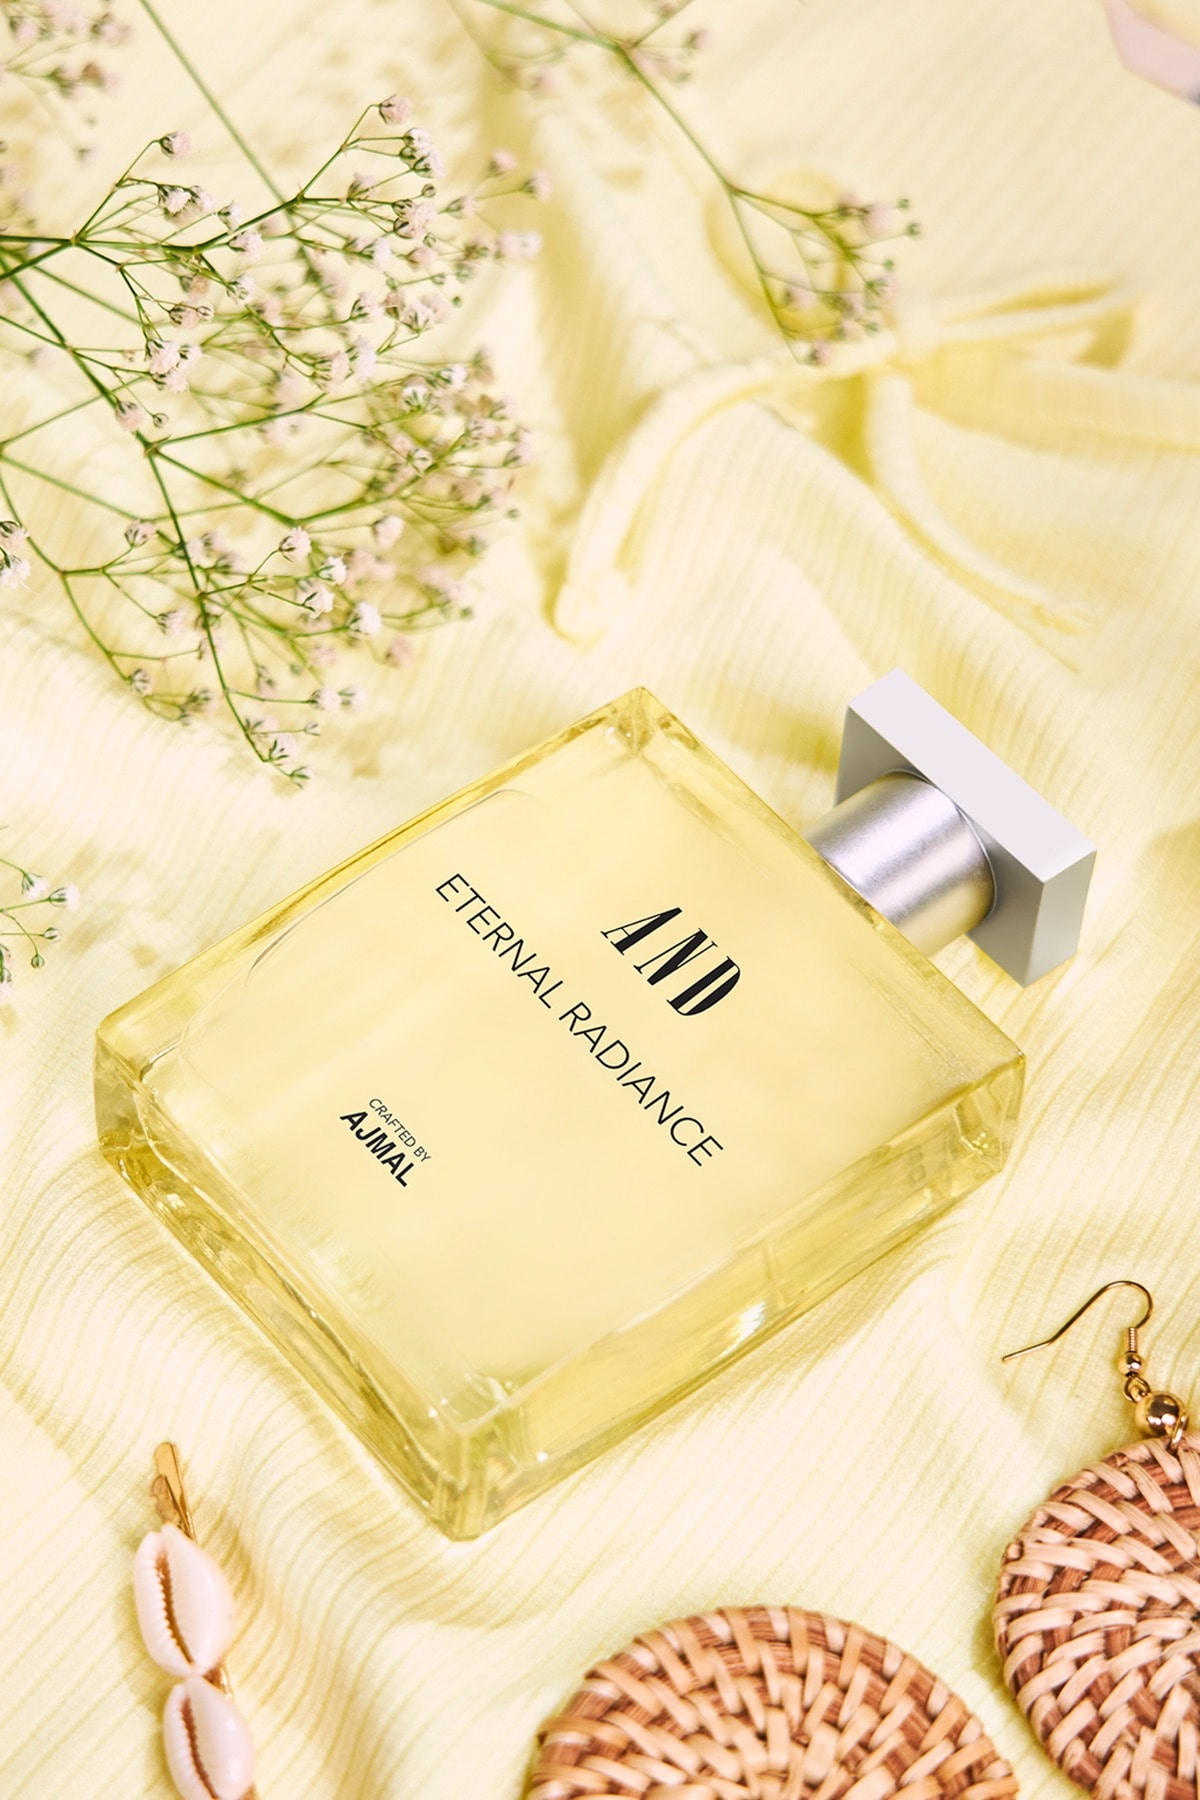 AND | Eternal Radiance Woody Rose Eau De Parfum